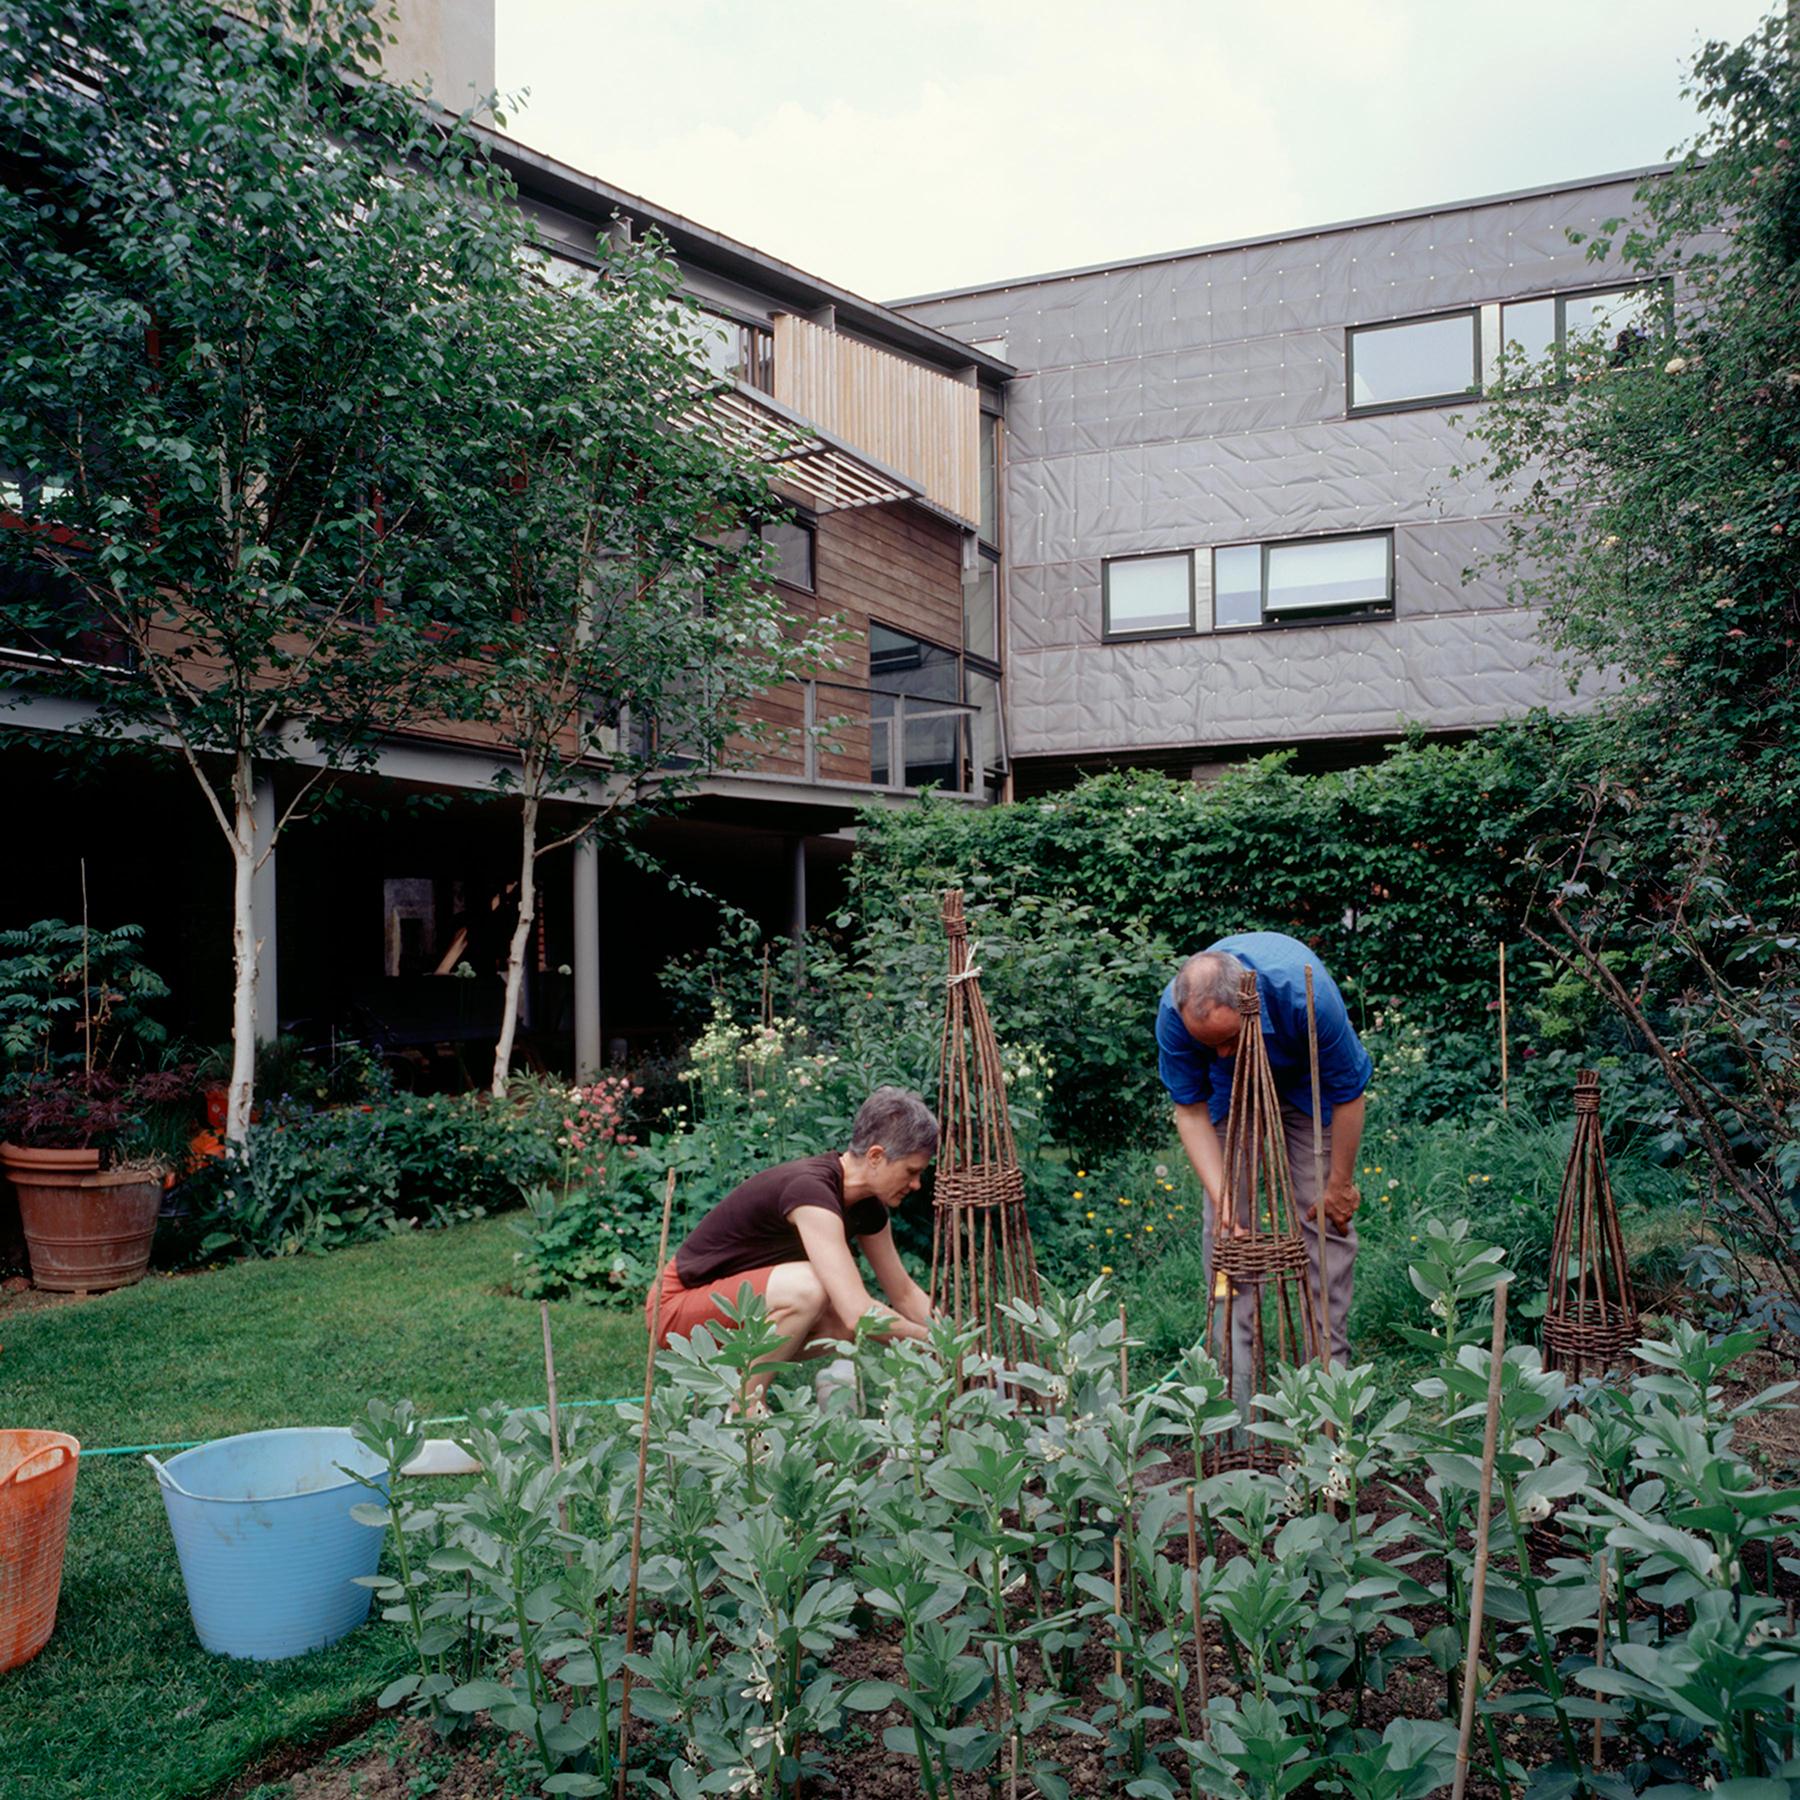 Sarah-Wigglesworth-Architects Stock Orchard Street planting 1800